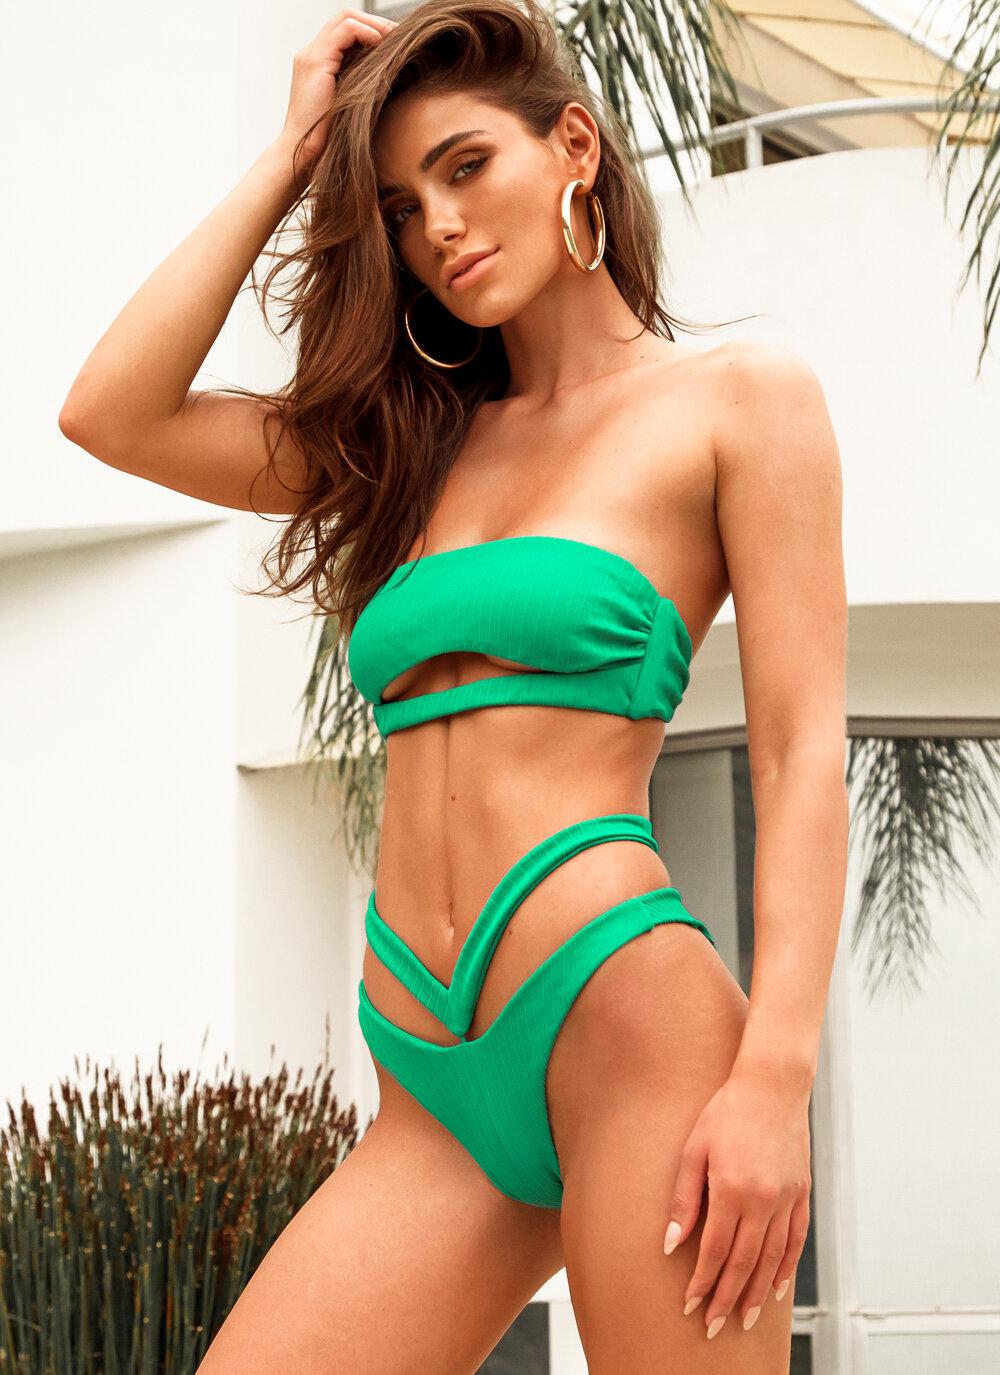 Miami Swim 4-21Luli Fama green.jpg